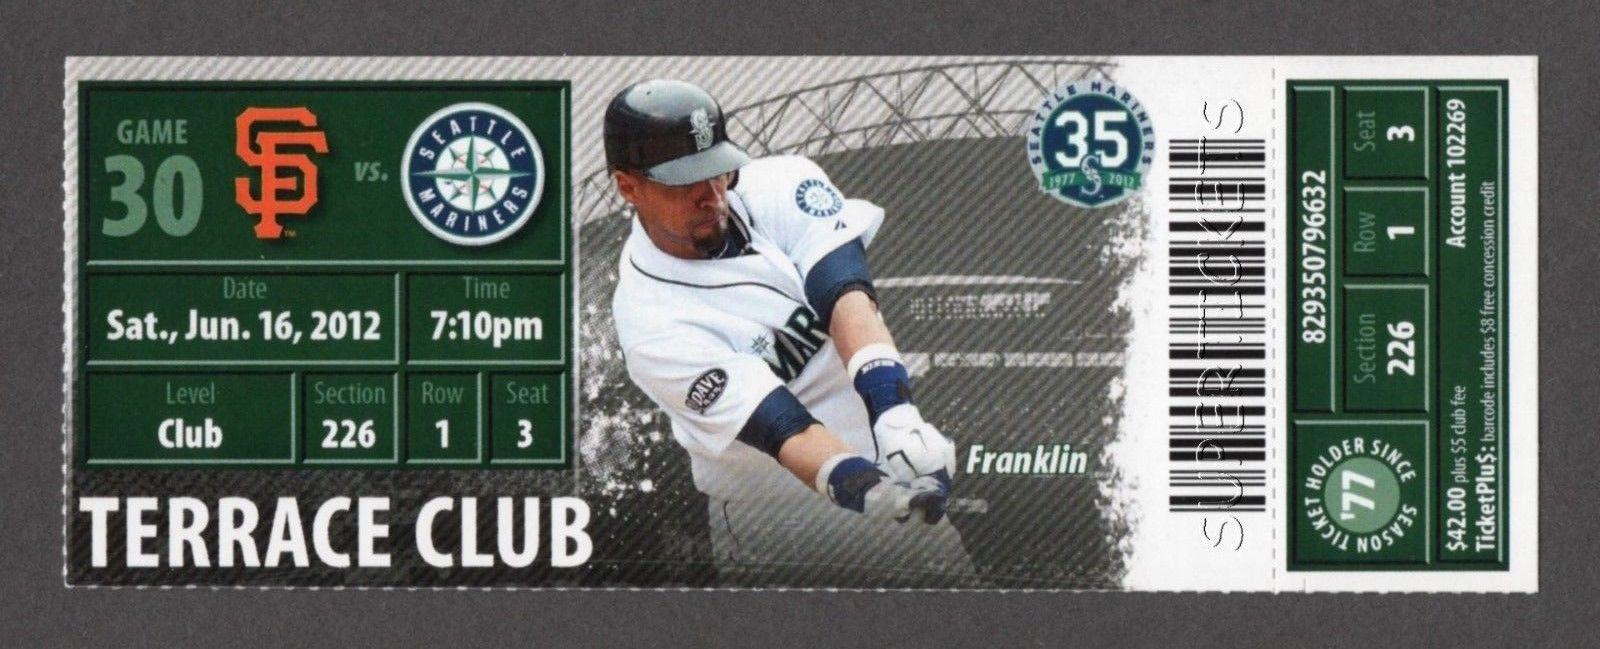 HISASHI IWAKUMA 1st MLB WIN - 2012 SF GIANTS @ MARINERS 6/16 TERRACE CLUB TICKET